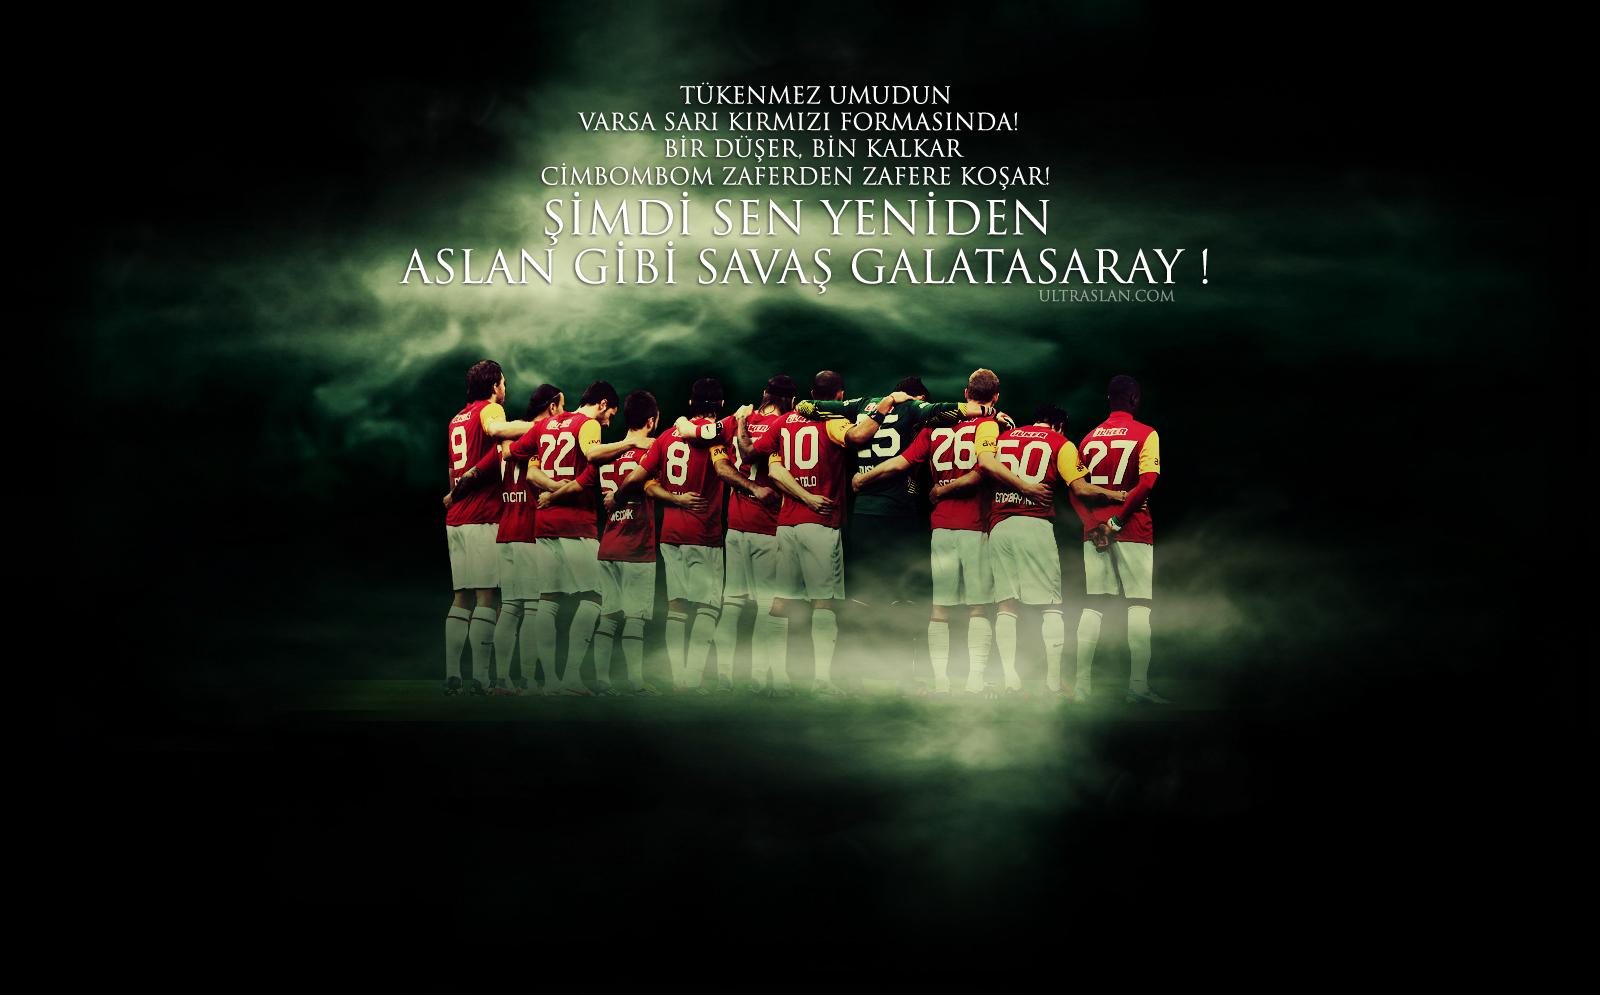 Galatasaray Wallpaper Iphone En G 252 Zel Galatasaray Hd Resimleri Galatasaray Hd